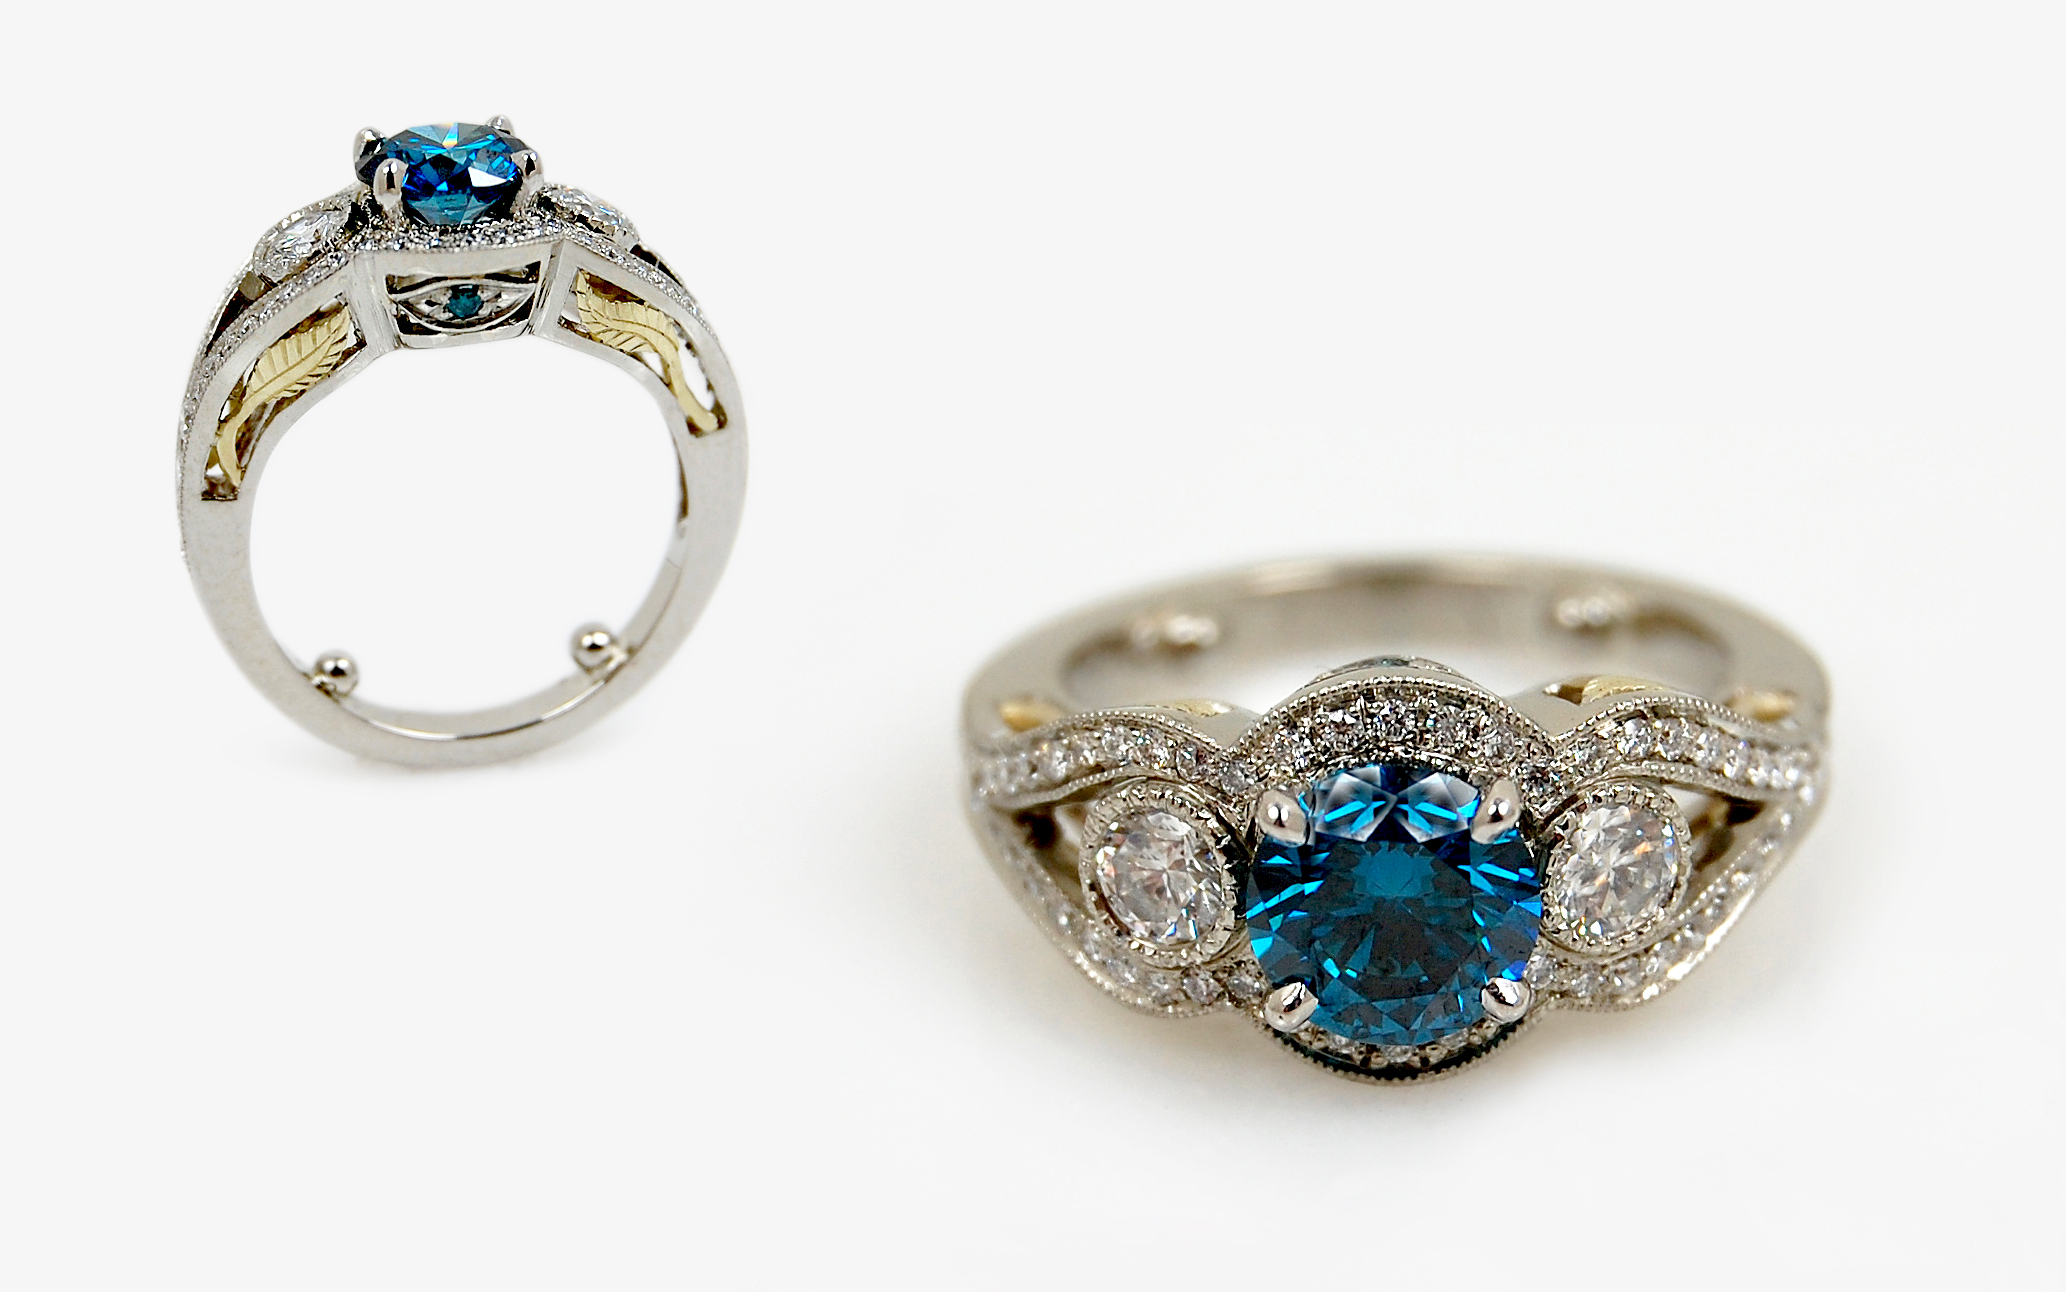 1 carat Blue Diamond with Diamond & Hand Fabricated Leaf Accents